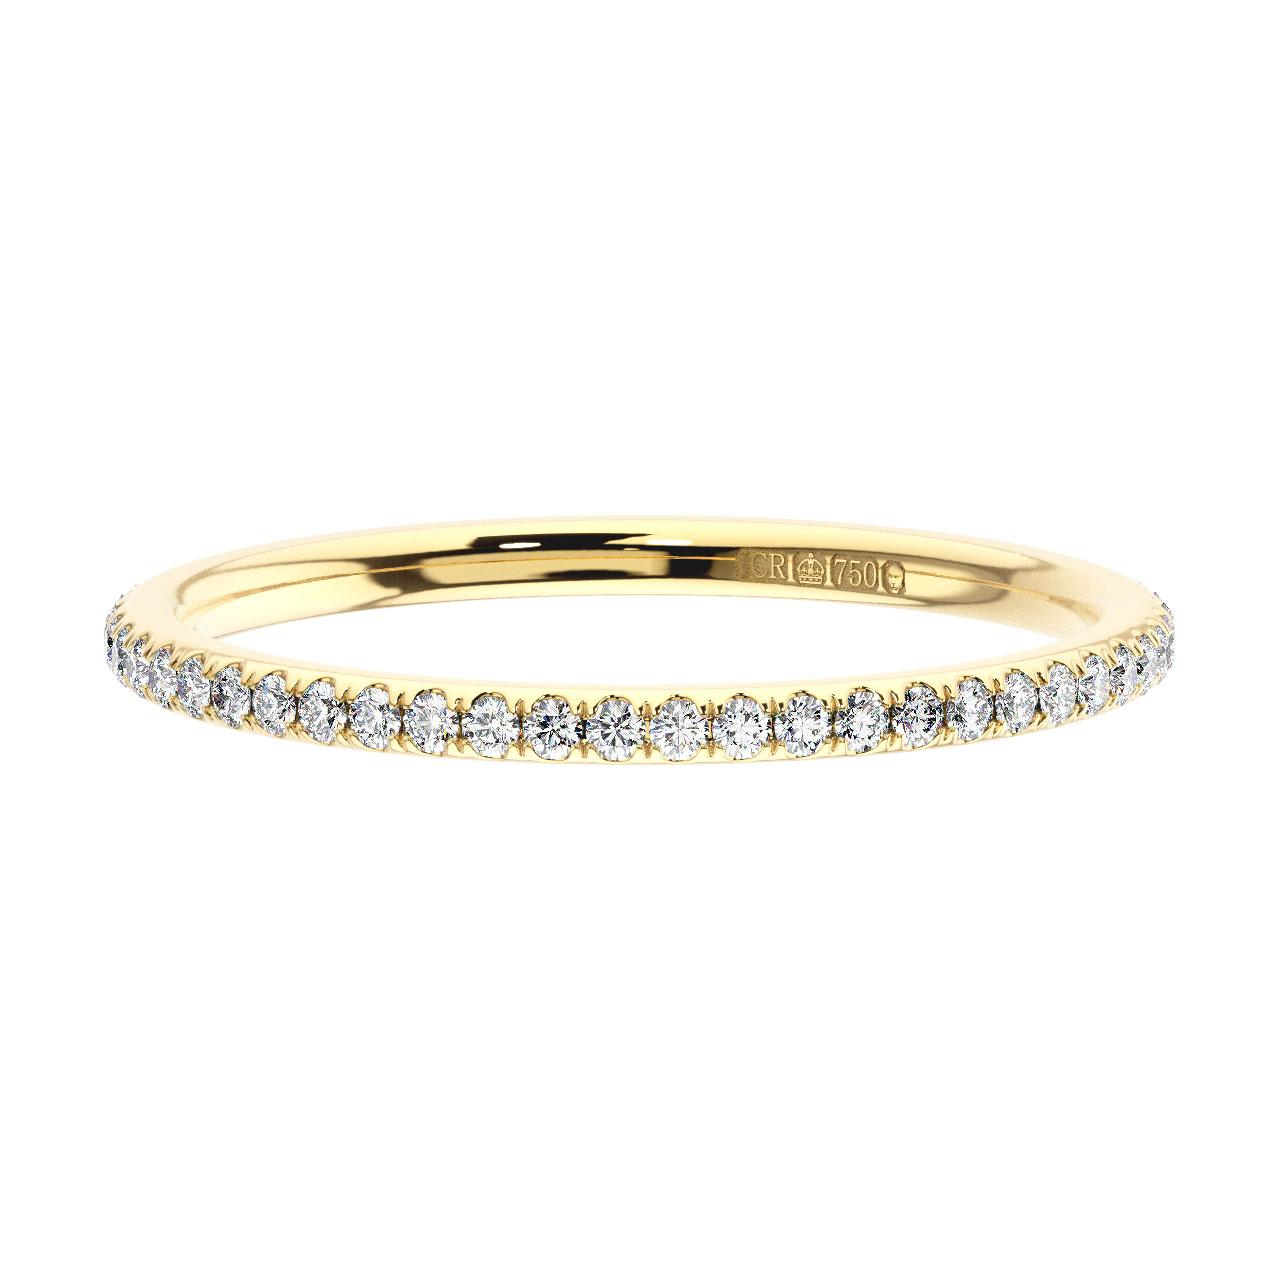 0.25 Carat Round Brilliant Cut Diamonds Full Eternity Ring Avaliable in 9K Gold